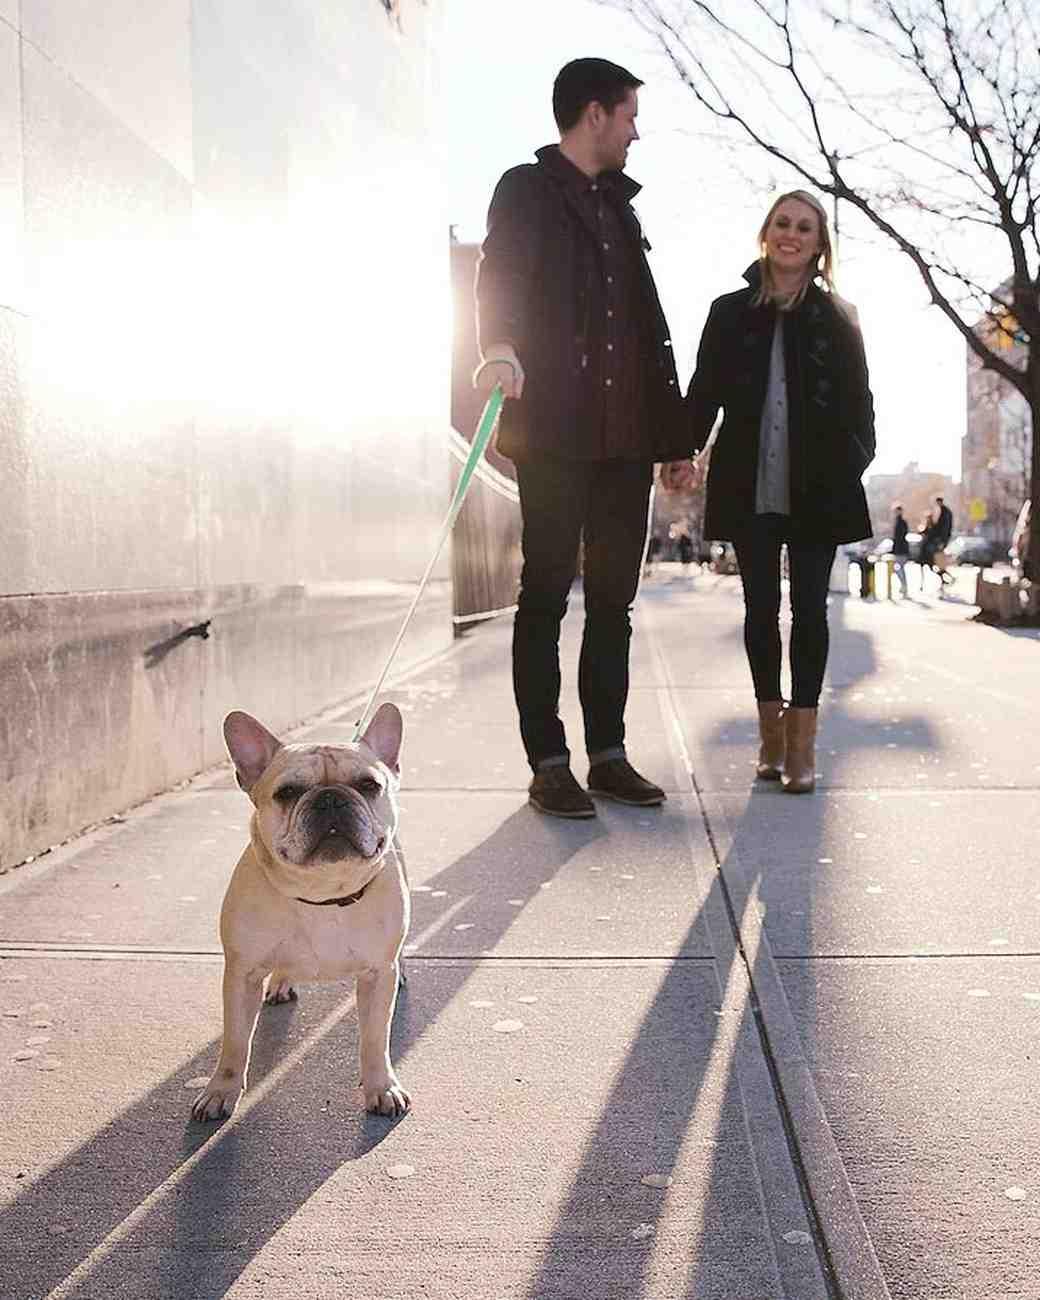 engagement-photos-lighting-winter-0116.jpg